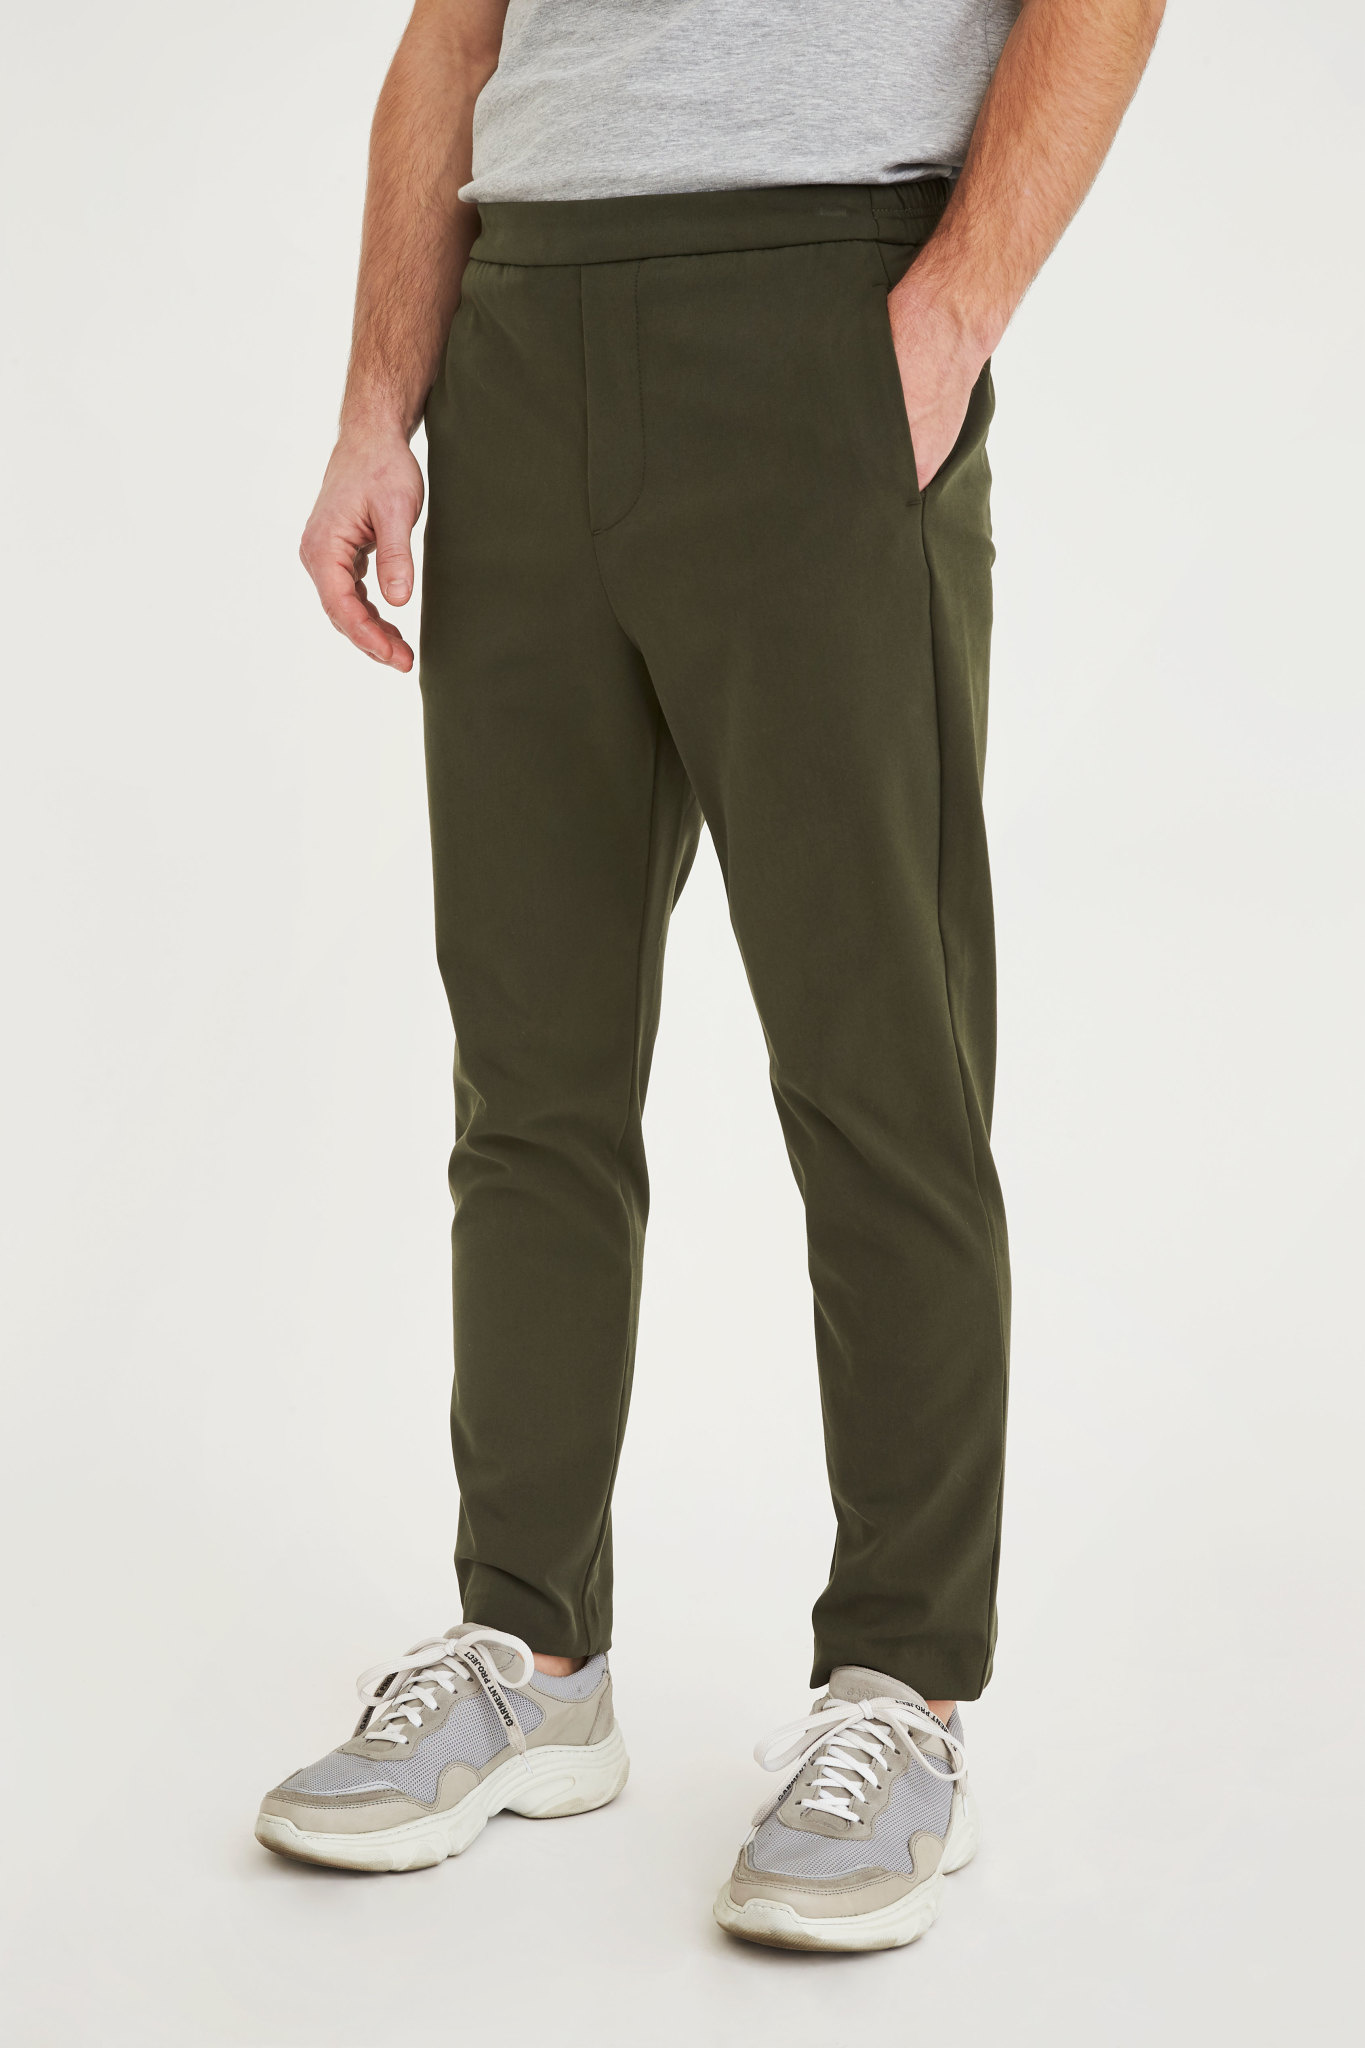 Plain Plain Riley 315 Pants Army Green